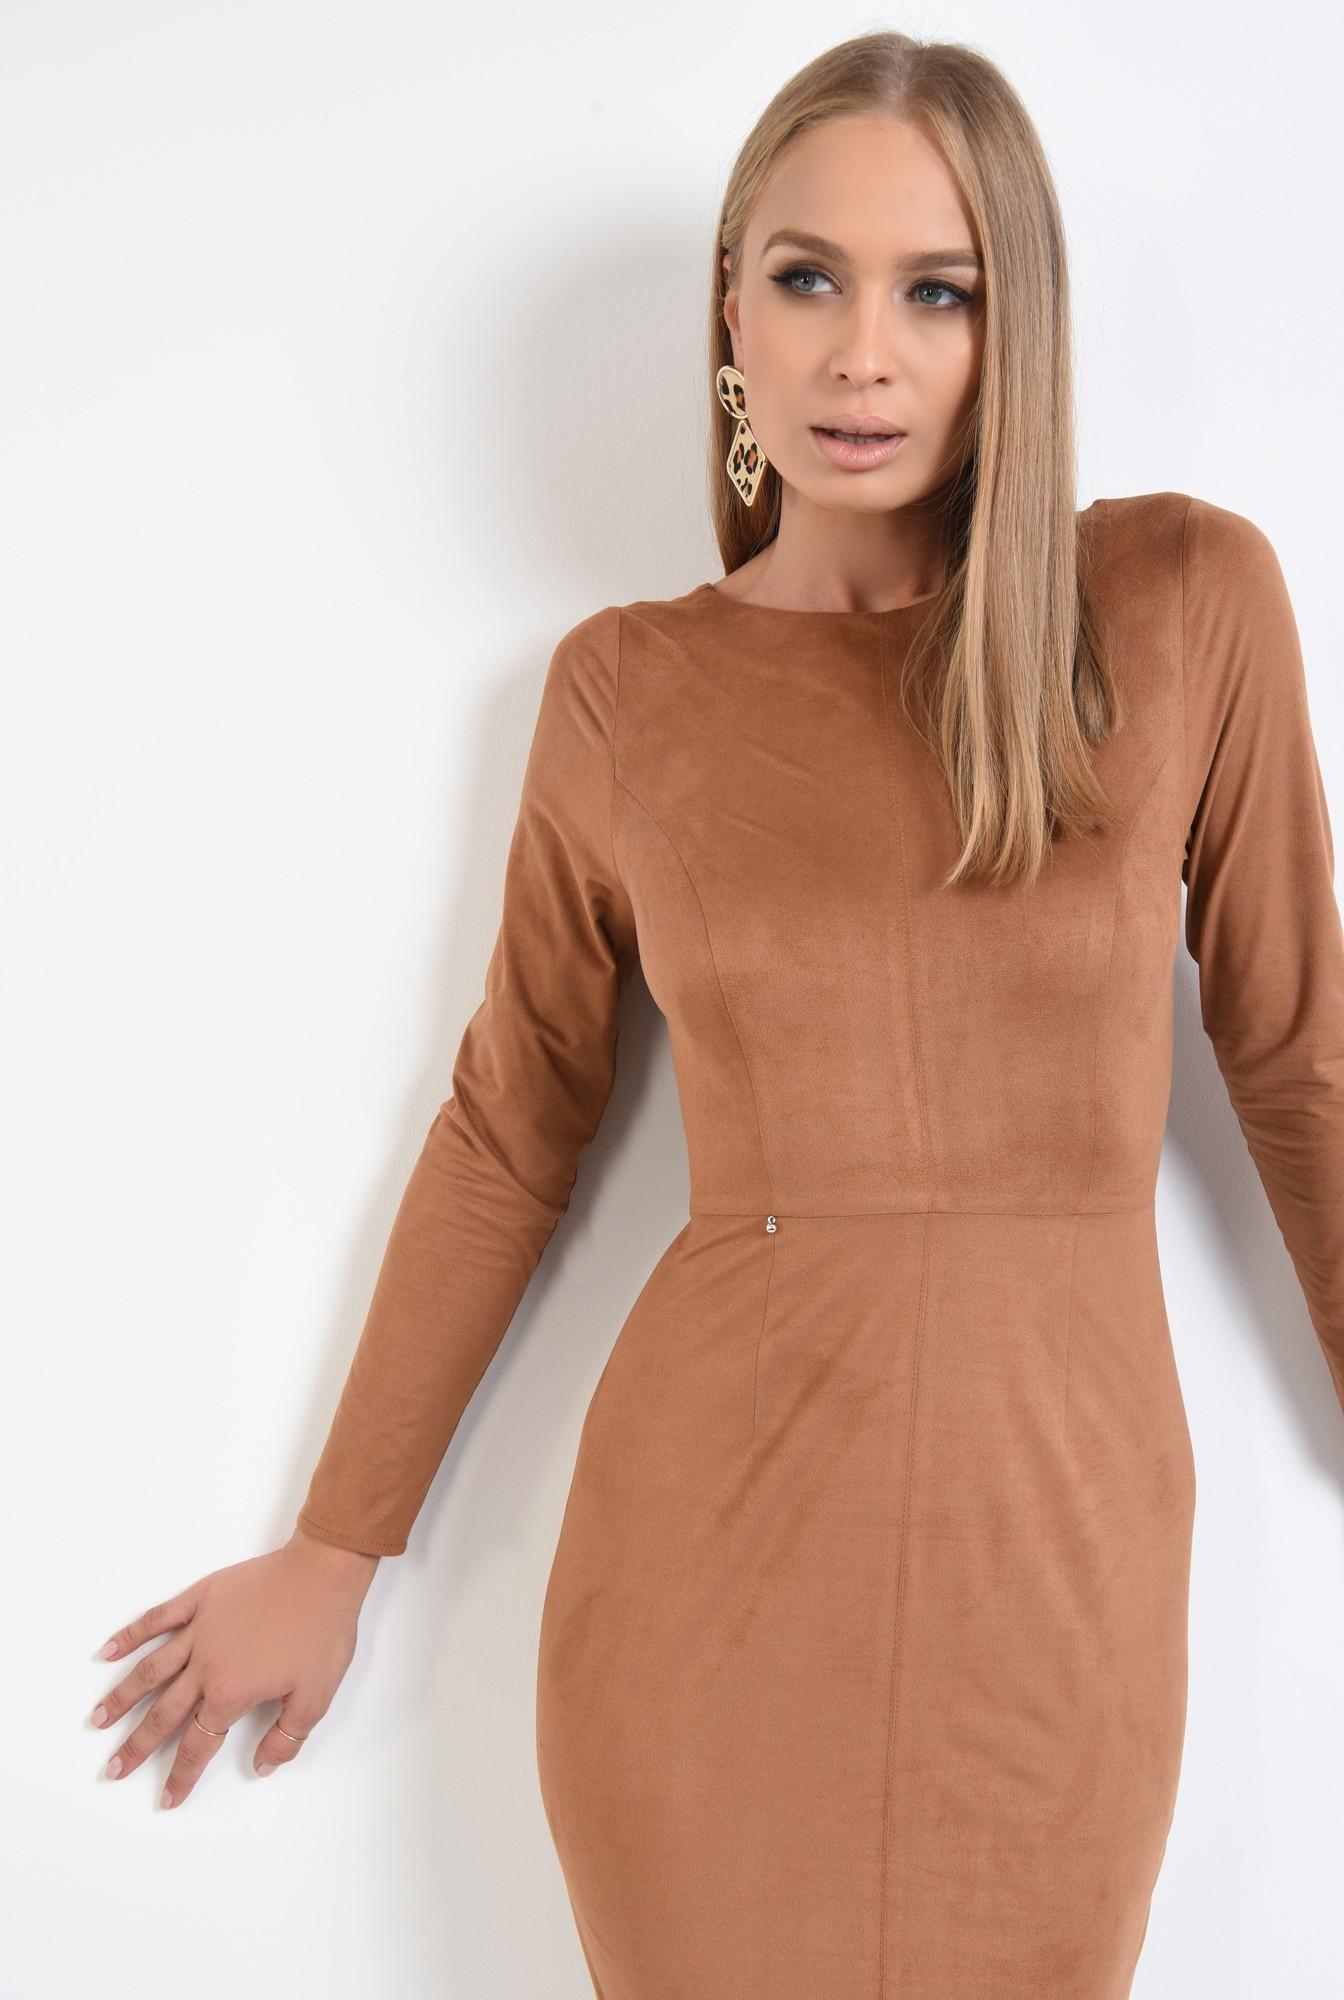 2 - 360 - rochie eleganta, piele intoarsa eco, maro